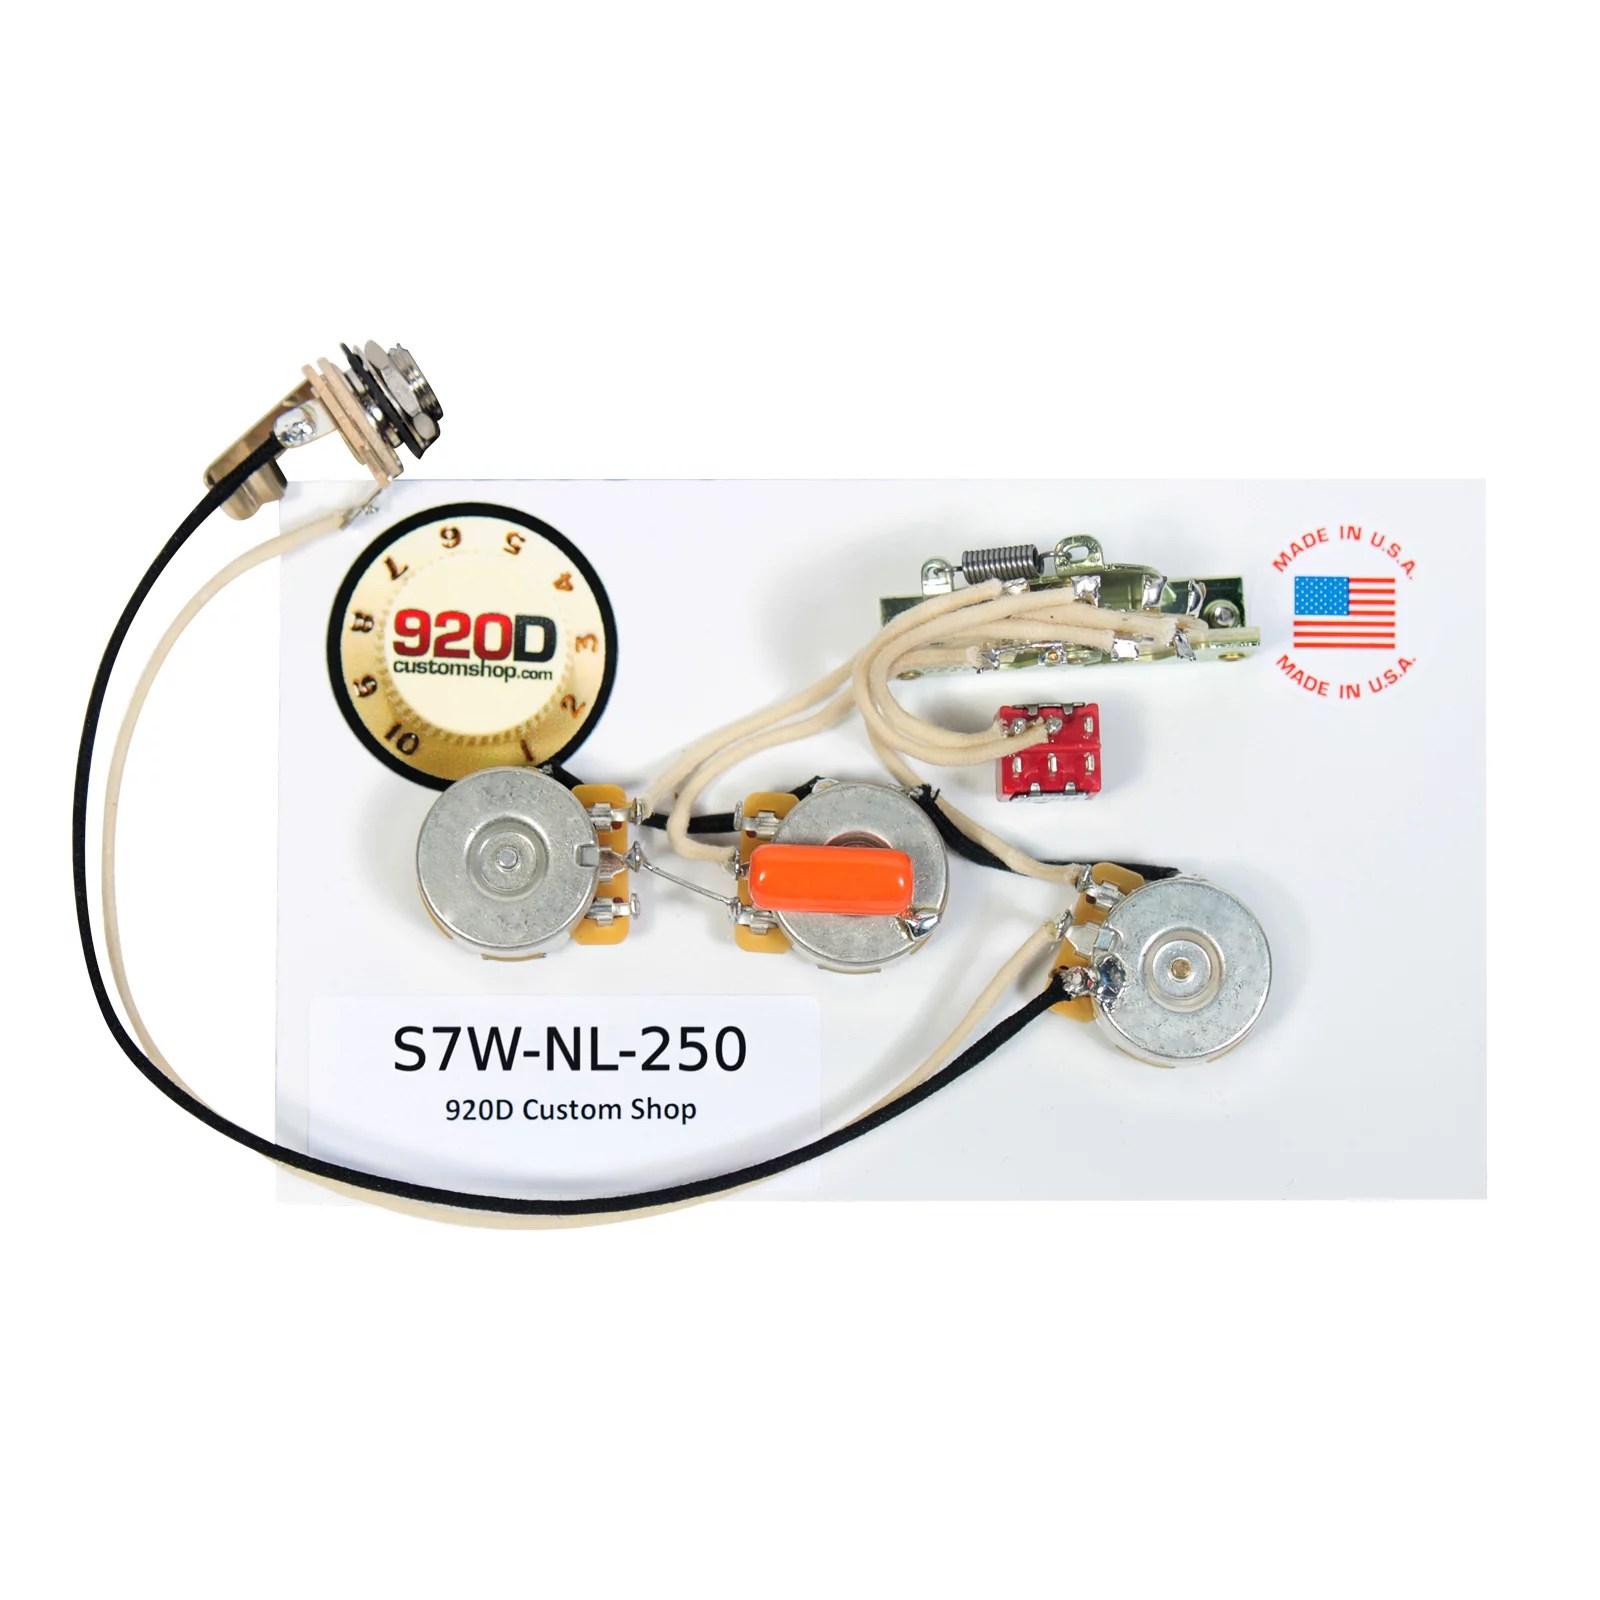 medium resolution of fender strat 7 way wiring kit w 2 no load 250k 022 f cap fender esquire wiring kit fender wiring kit